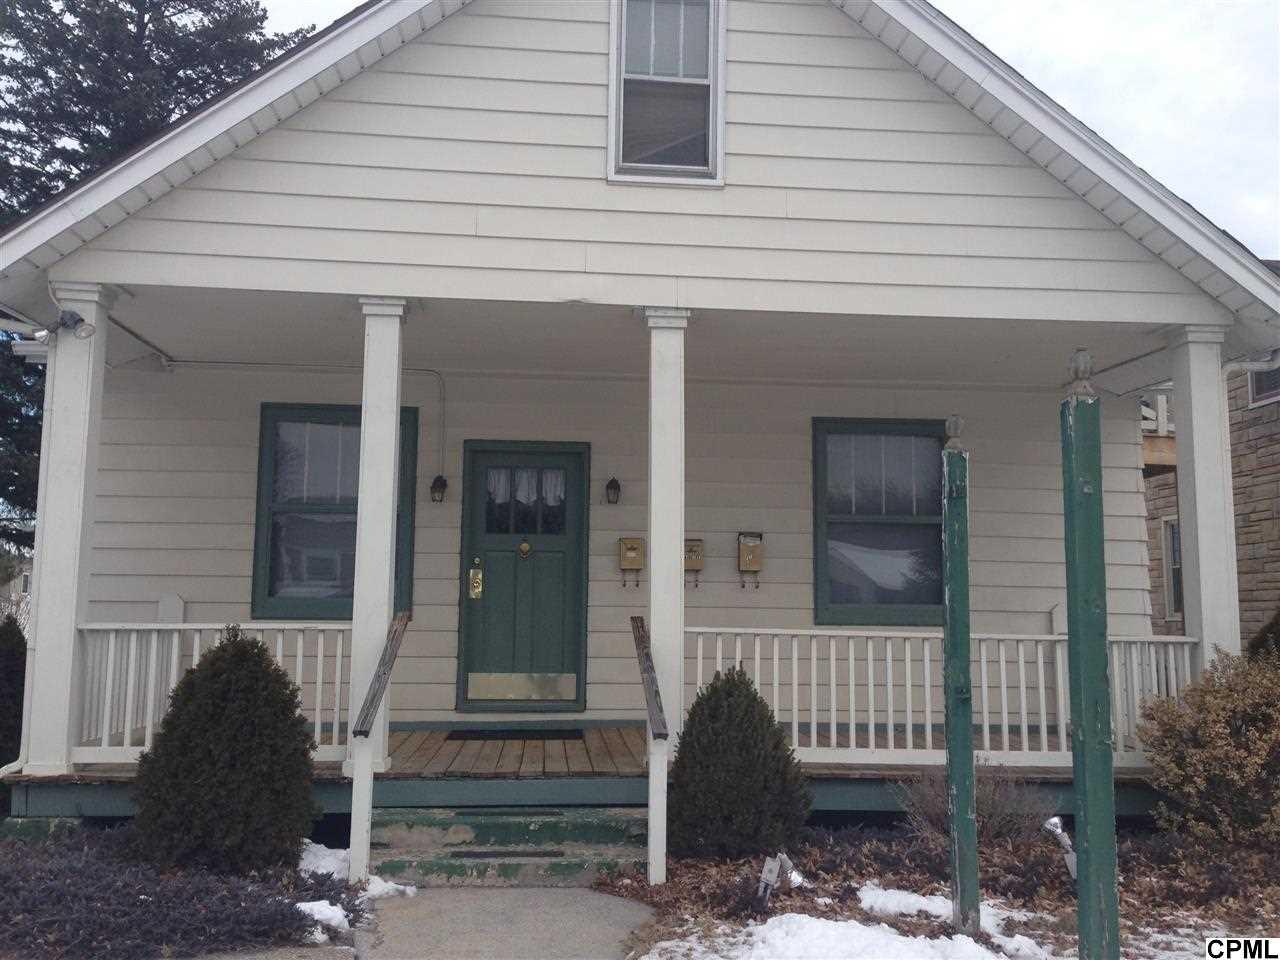 Rental Homes for Rent, ListingId:31843464, location: 4820 Derry Street Rear 1st Flr. Harrisburg 17111